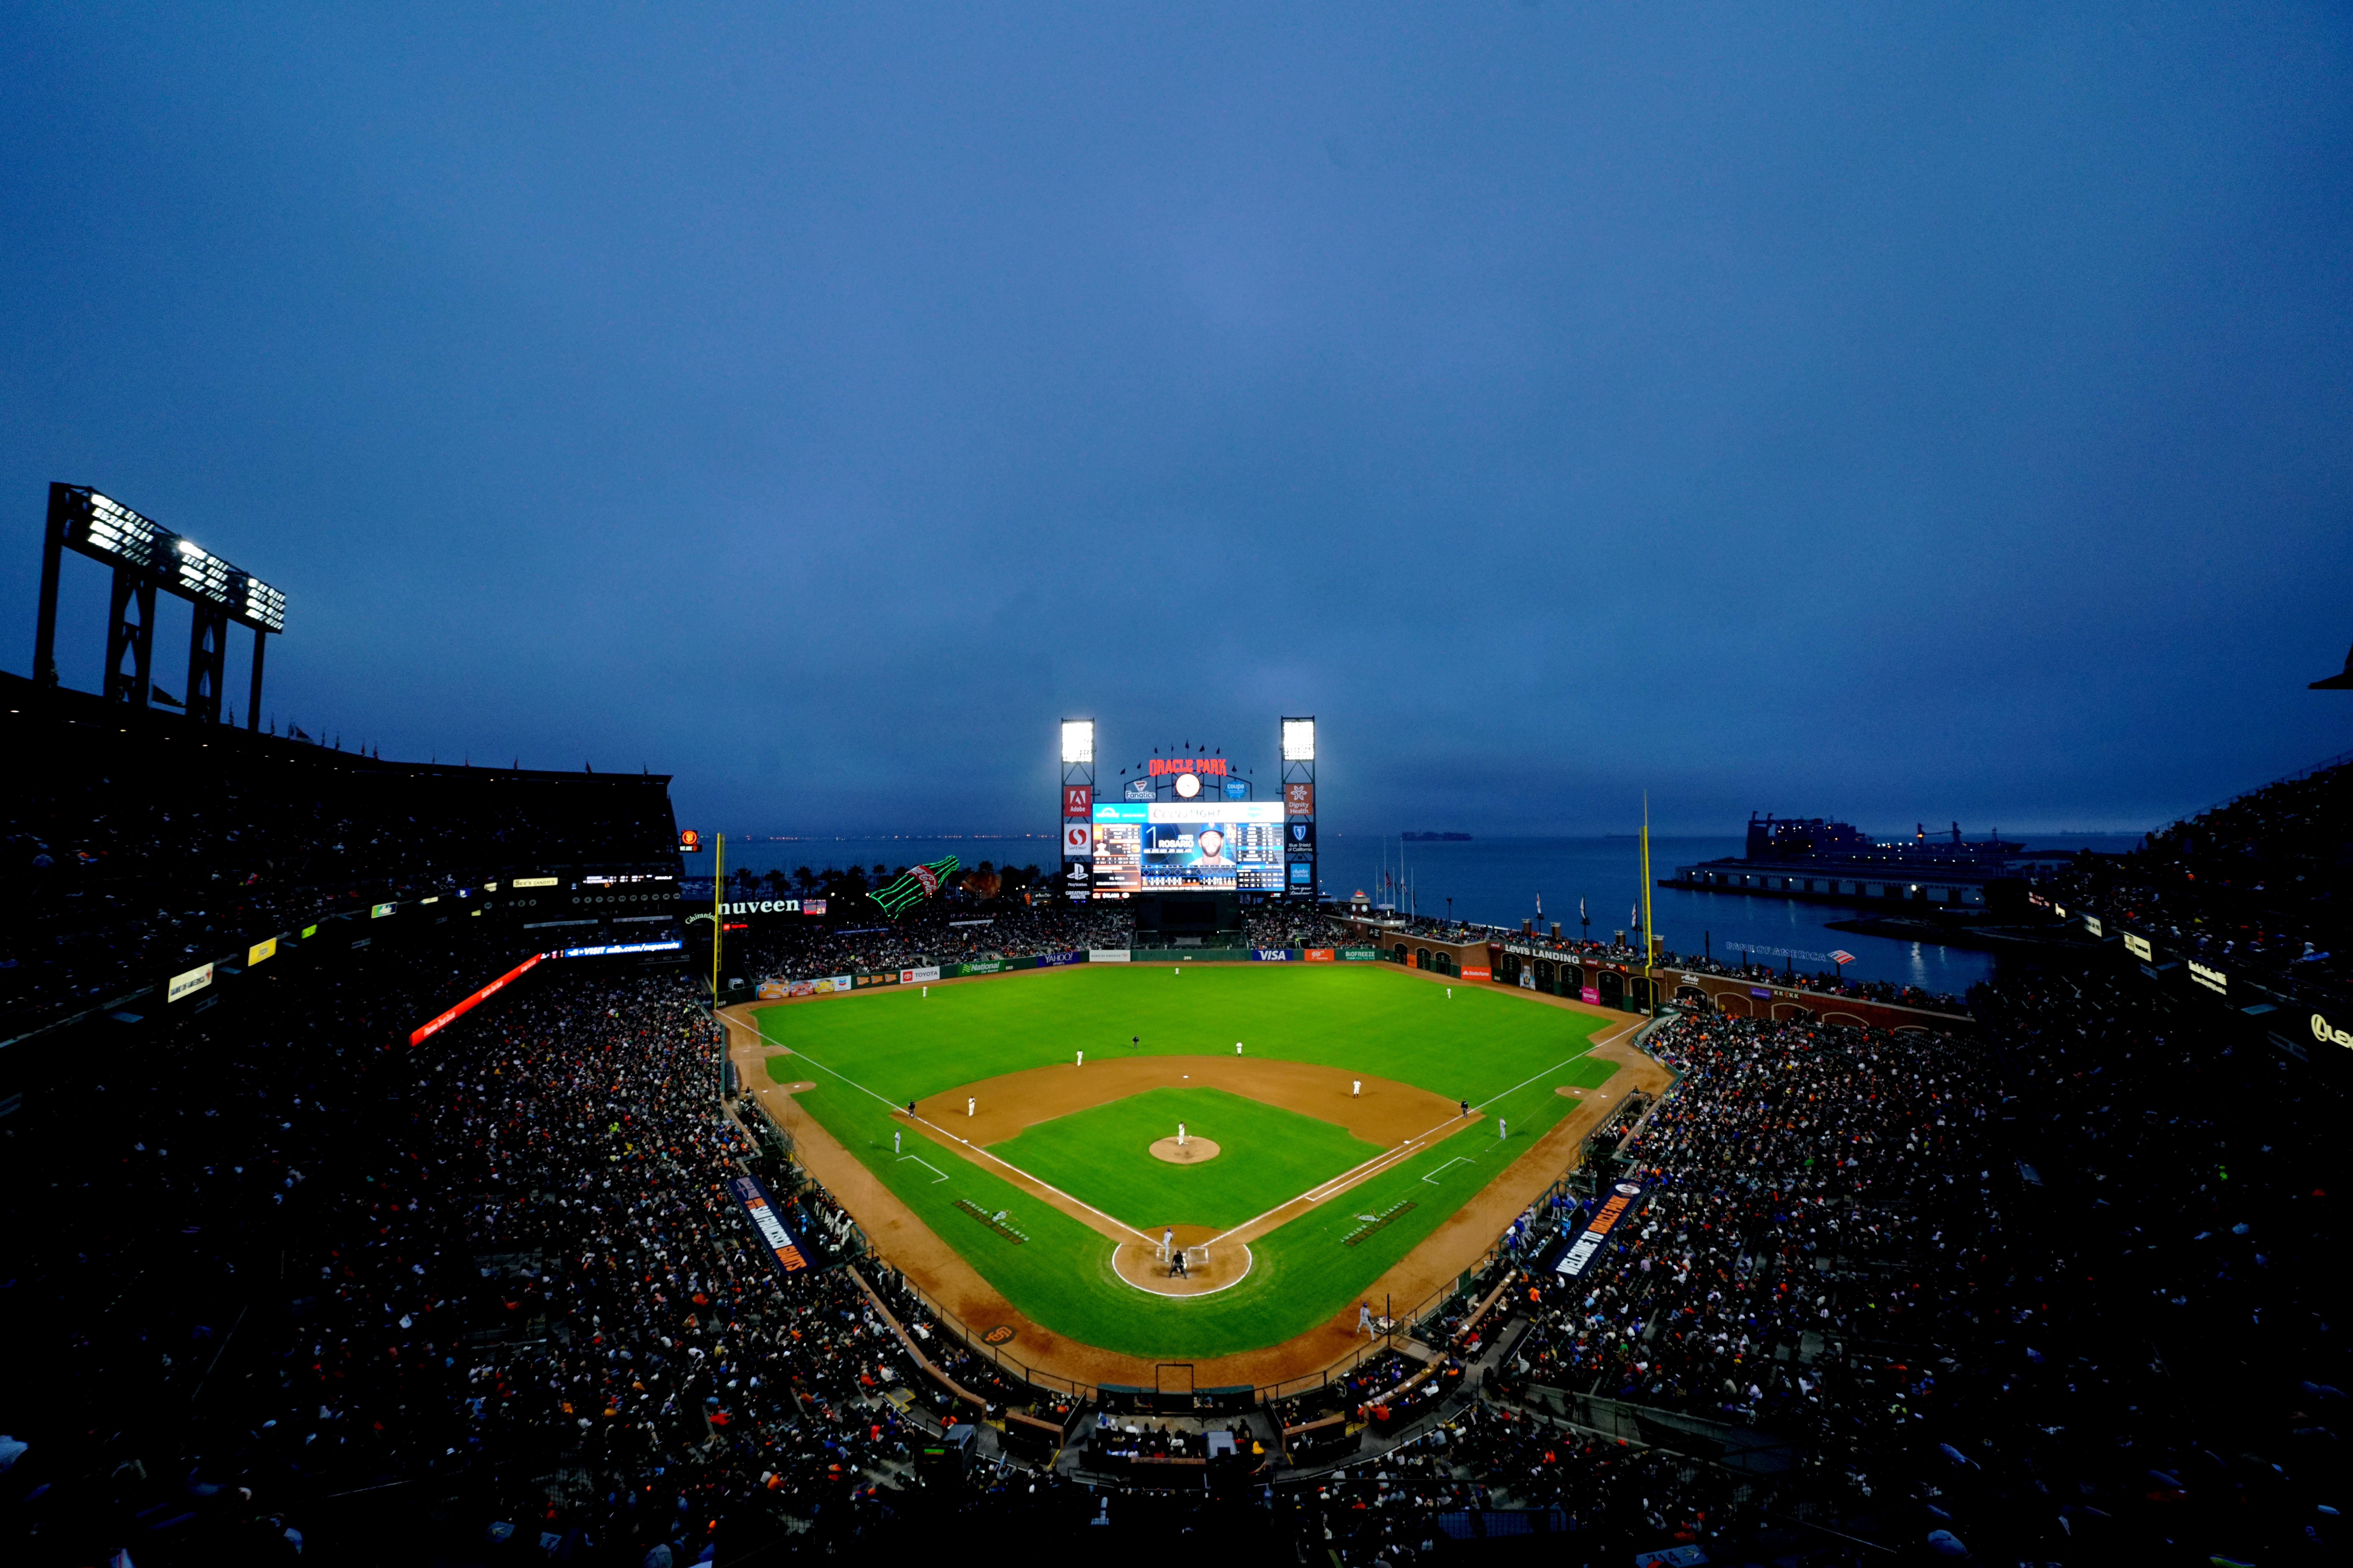 New York Mets v. San Francisco Giants